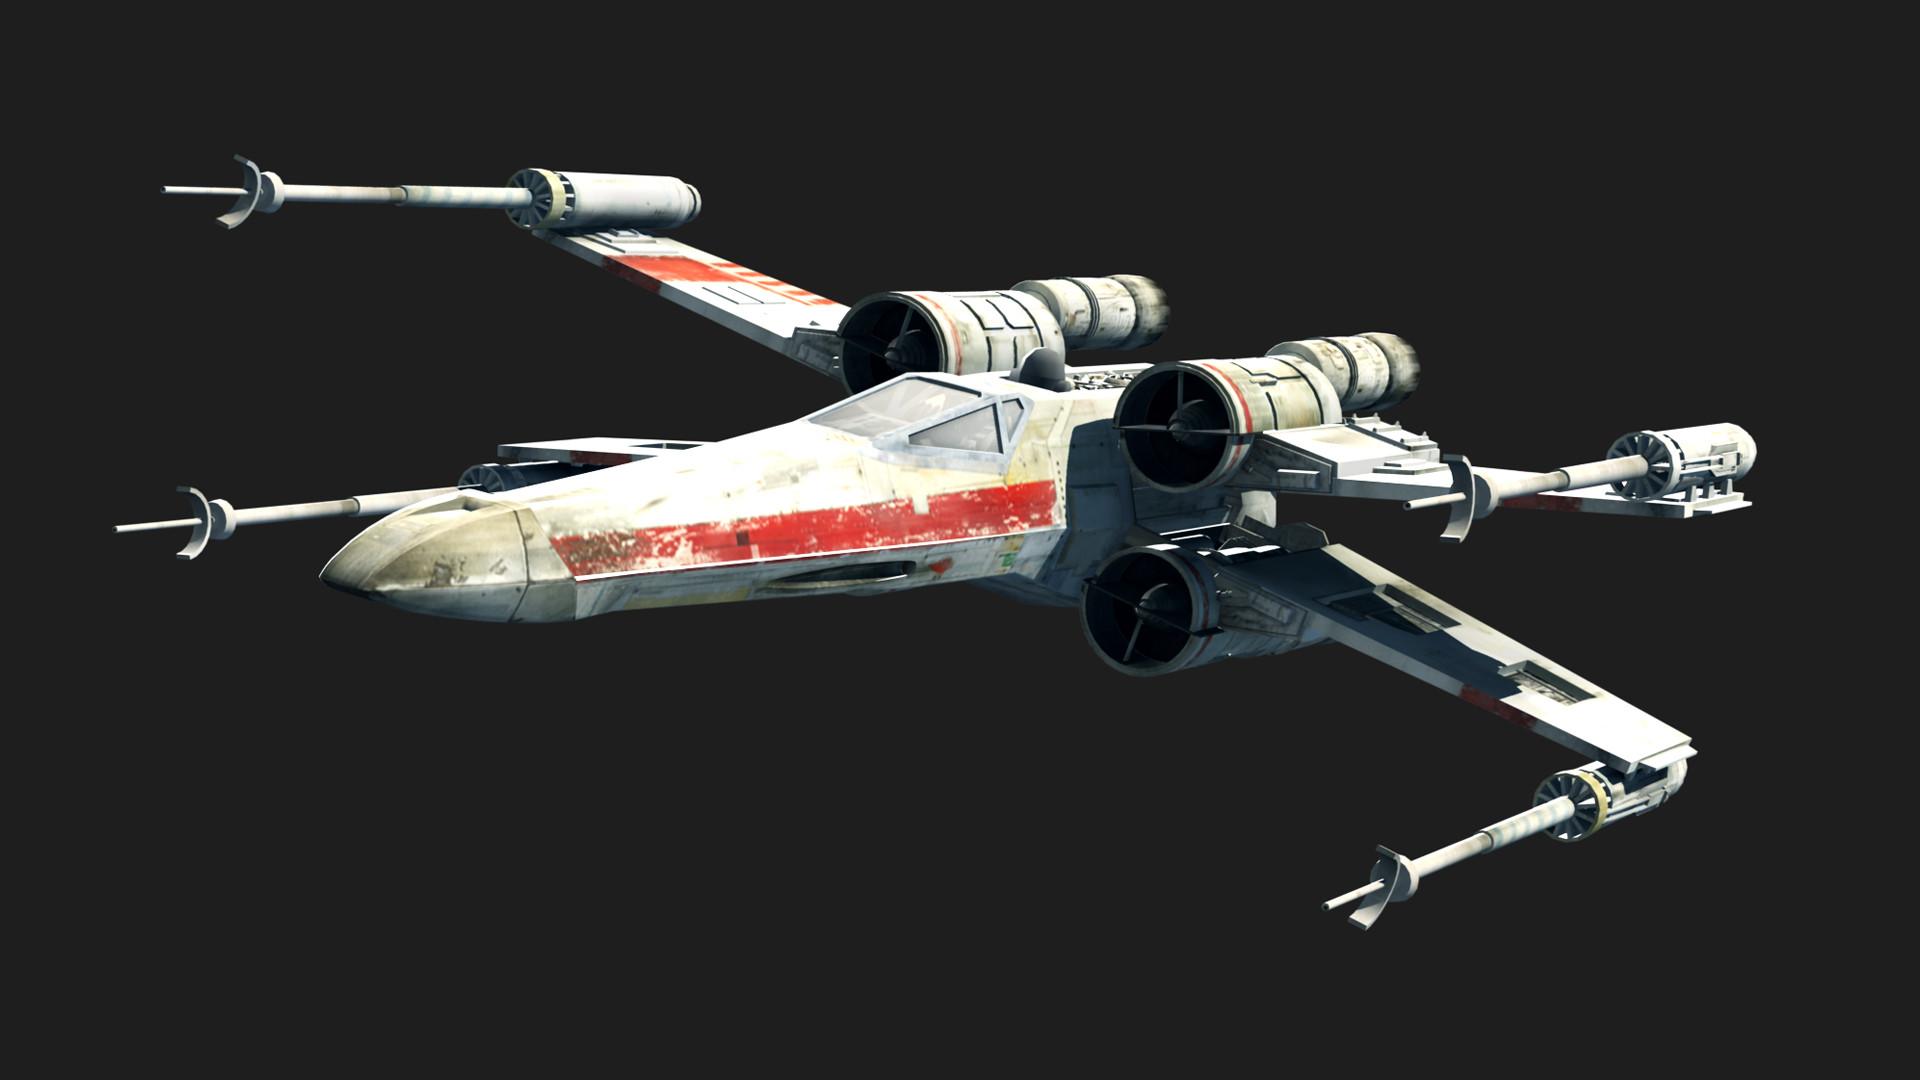 ArtStation - Star Wars Rogue Leader vehicles, Bastian Hoppe